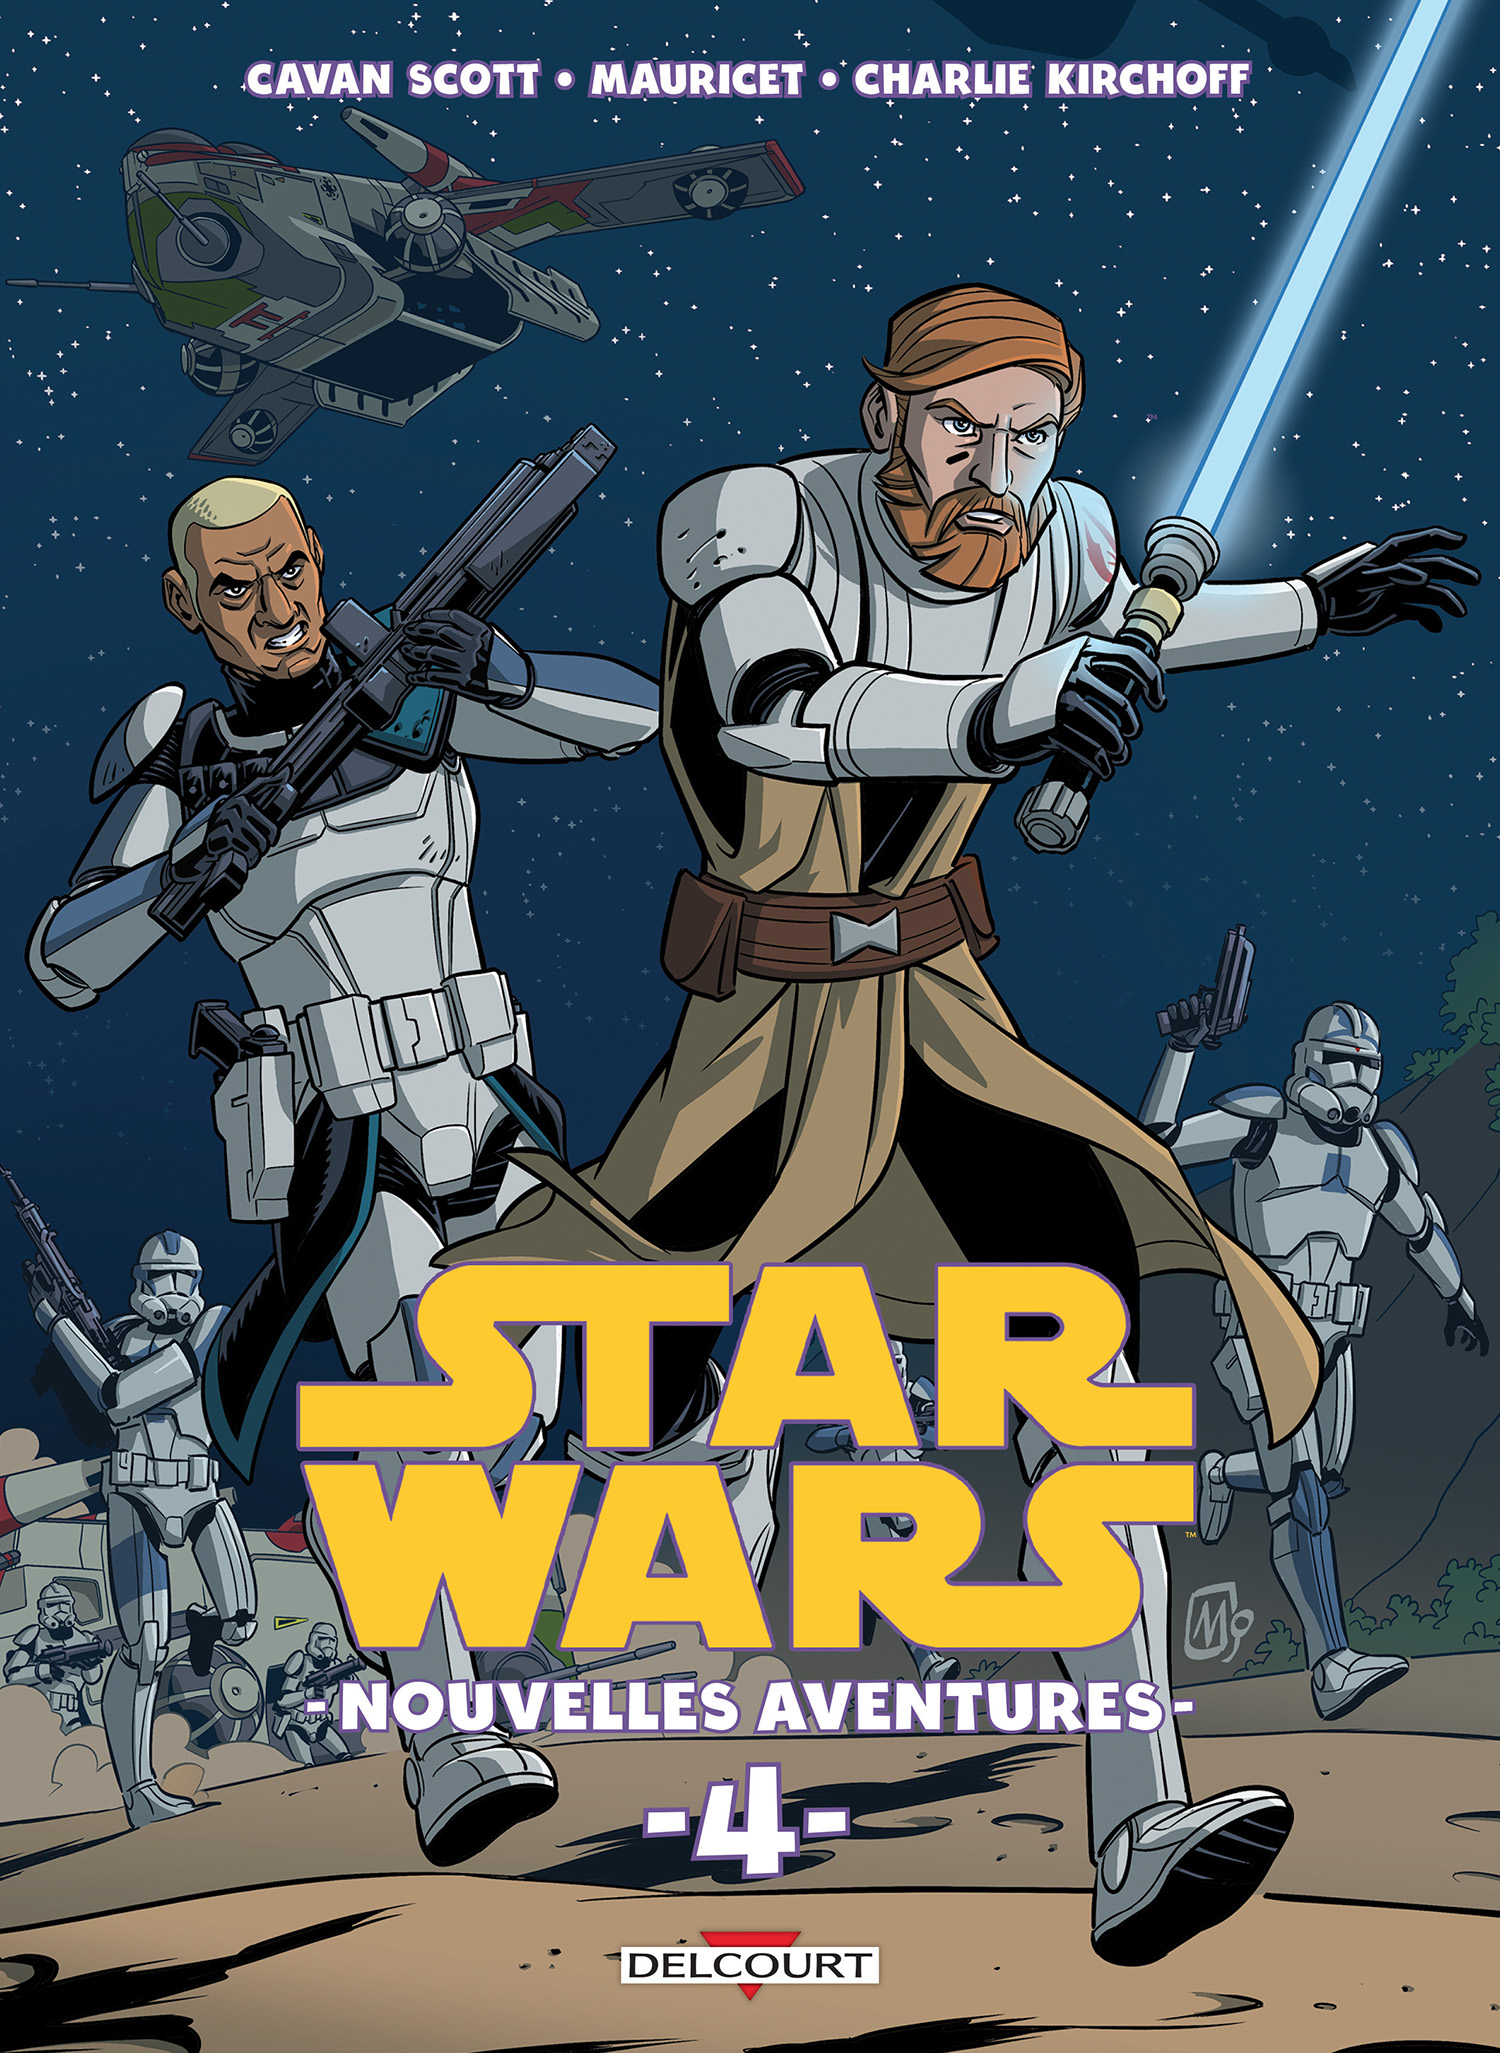 Star Wars - Nouvelles Aventures 4